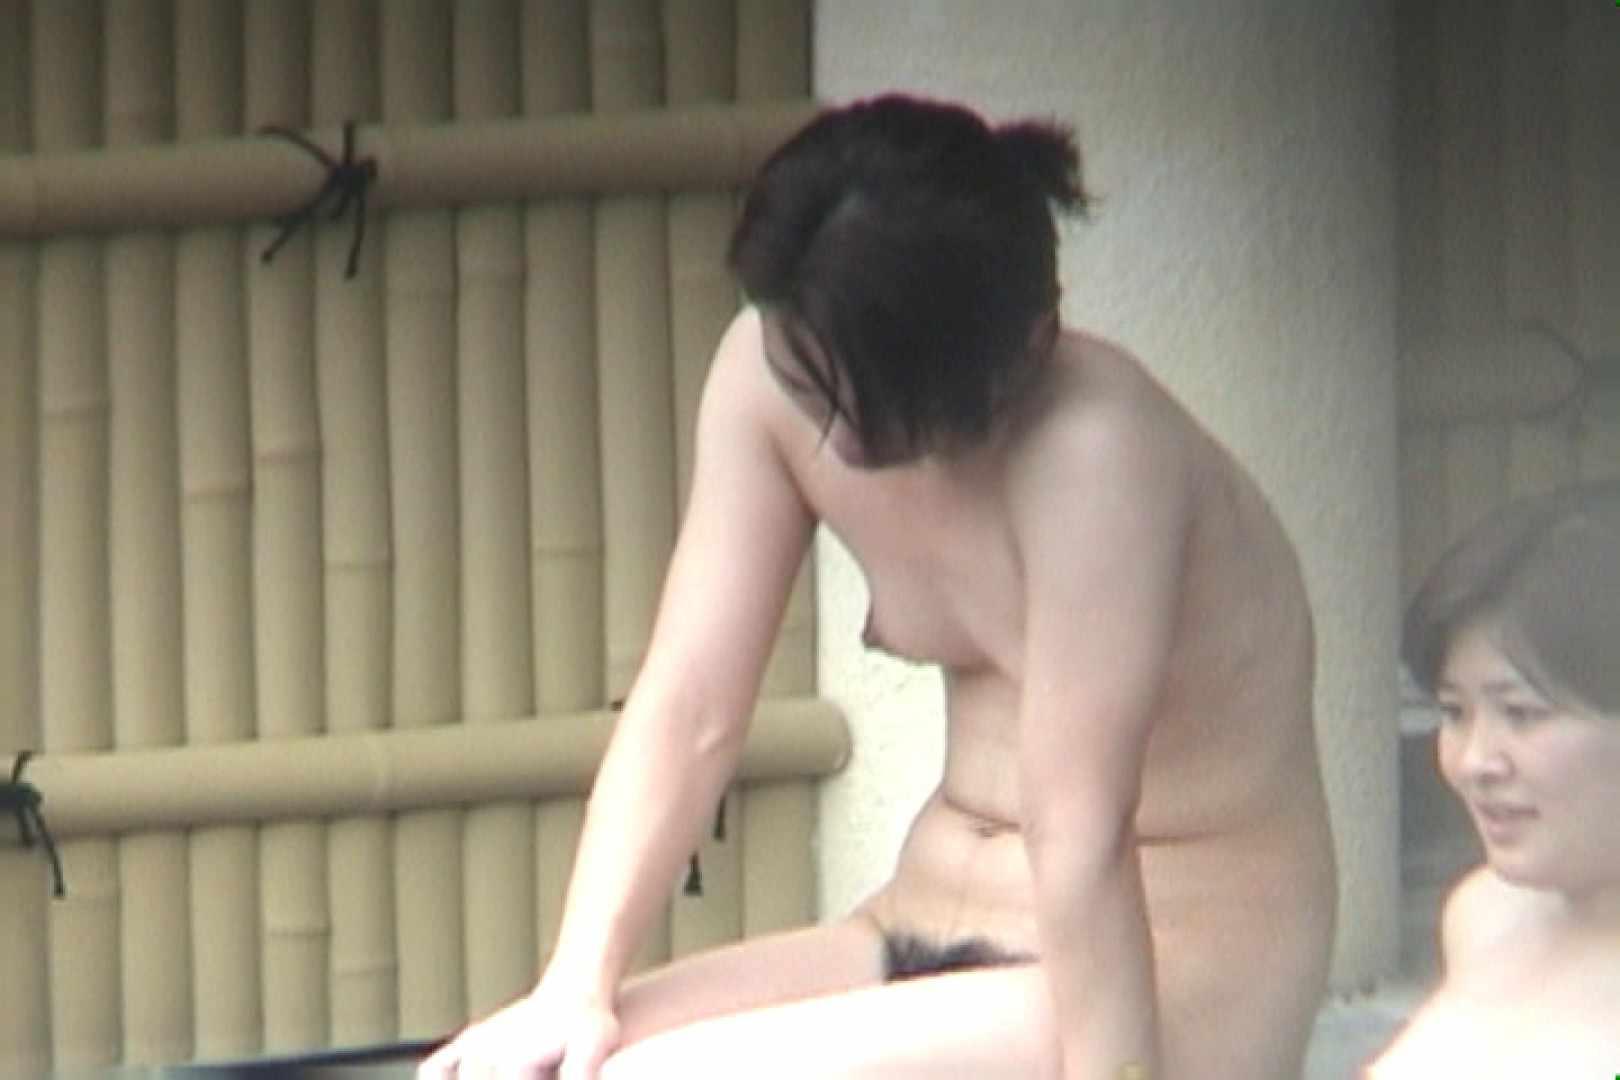 Aquaな露天風呂Vol.558 OLセックス | 盗撮  81画像 70